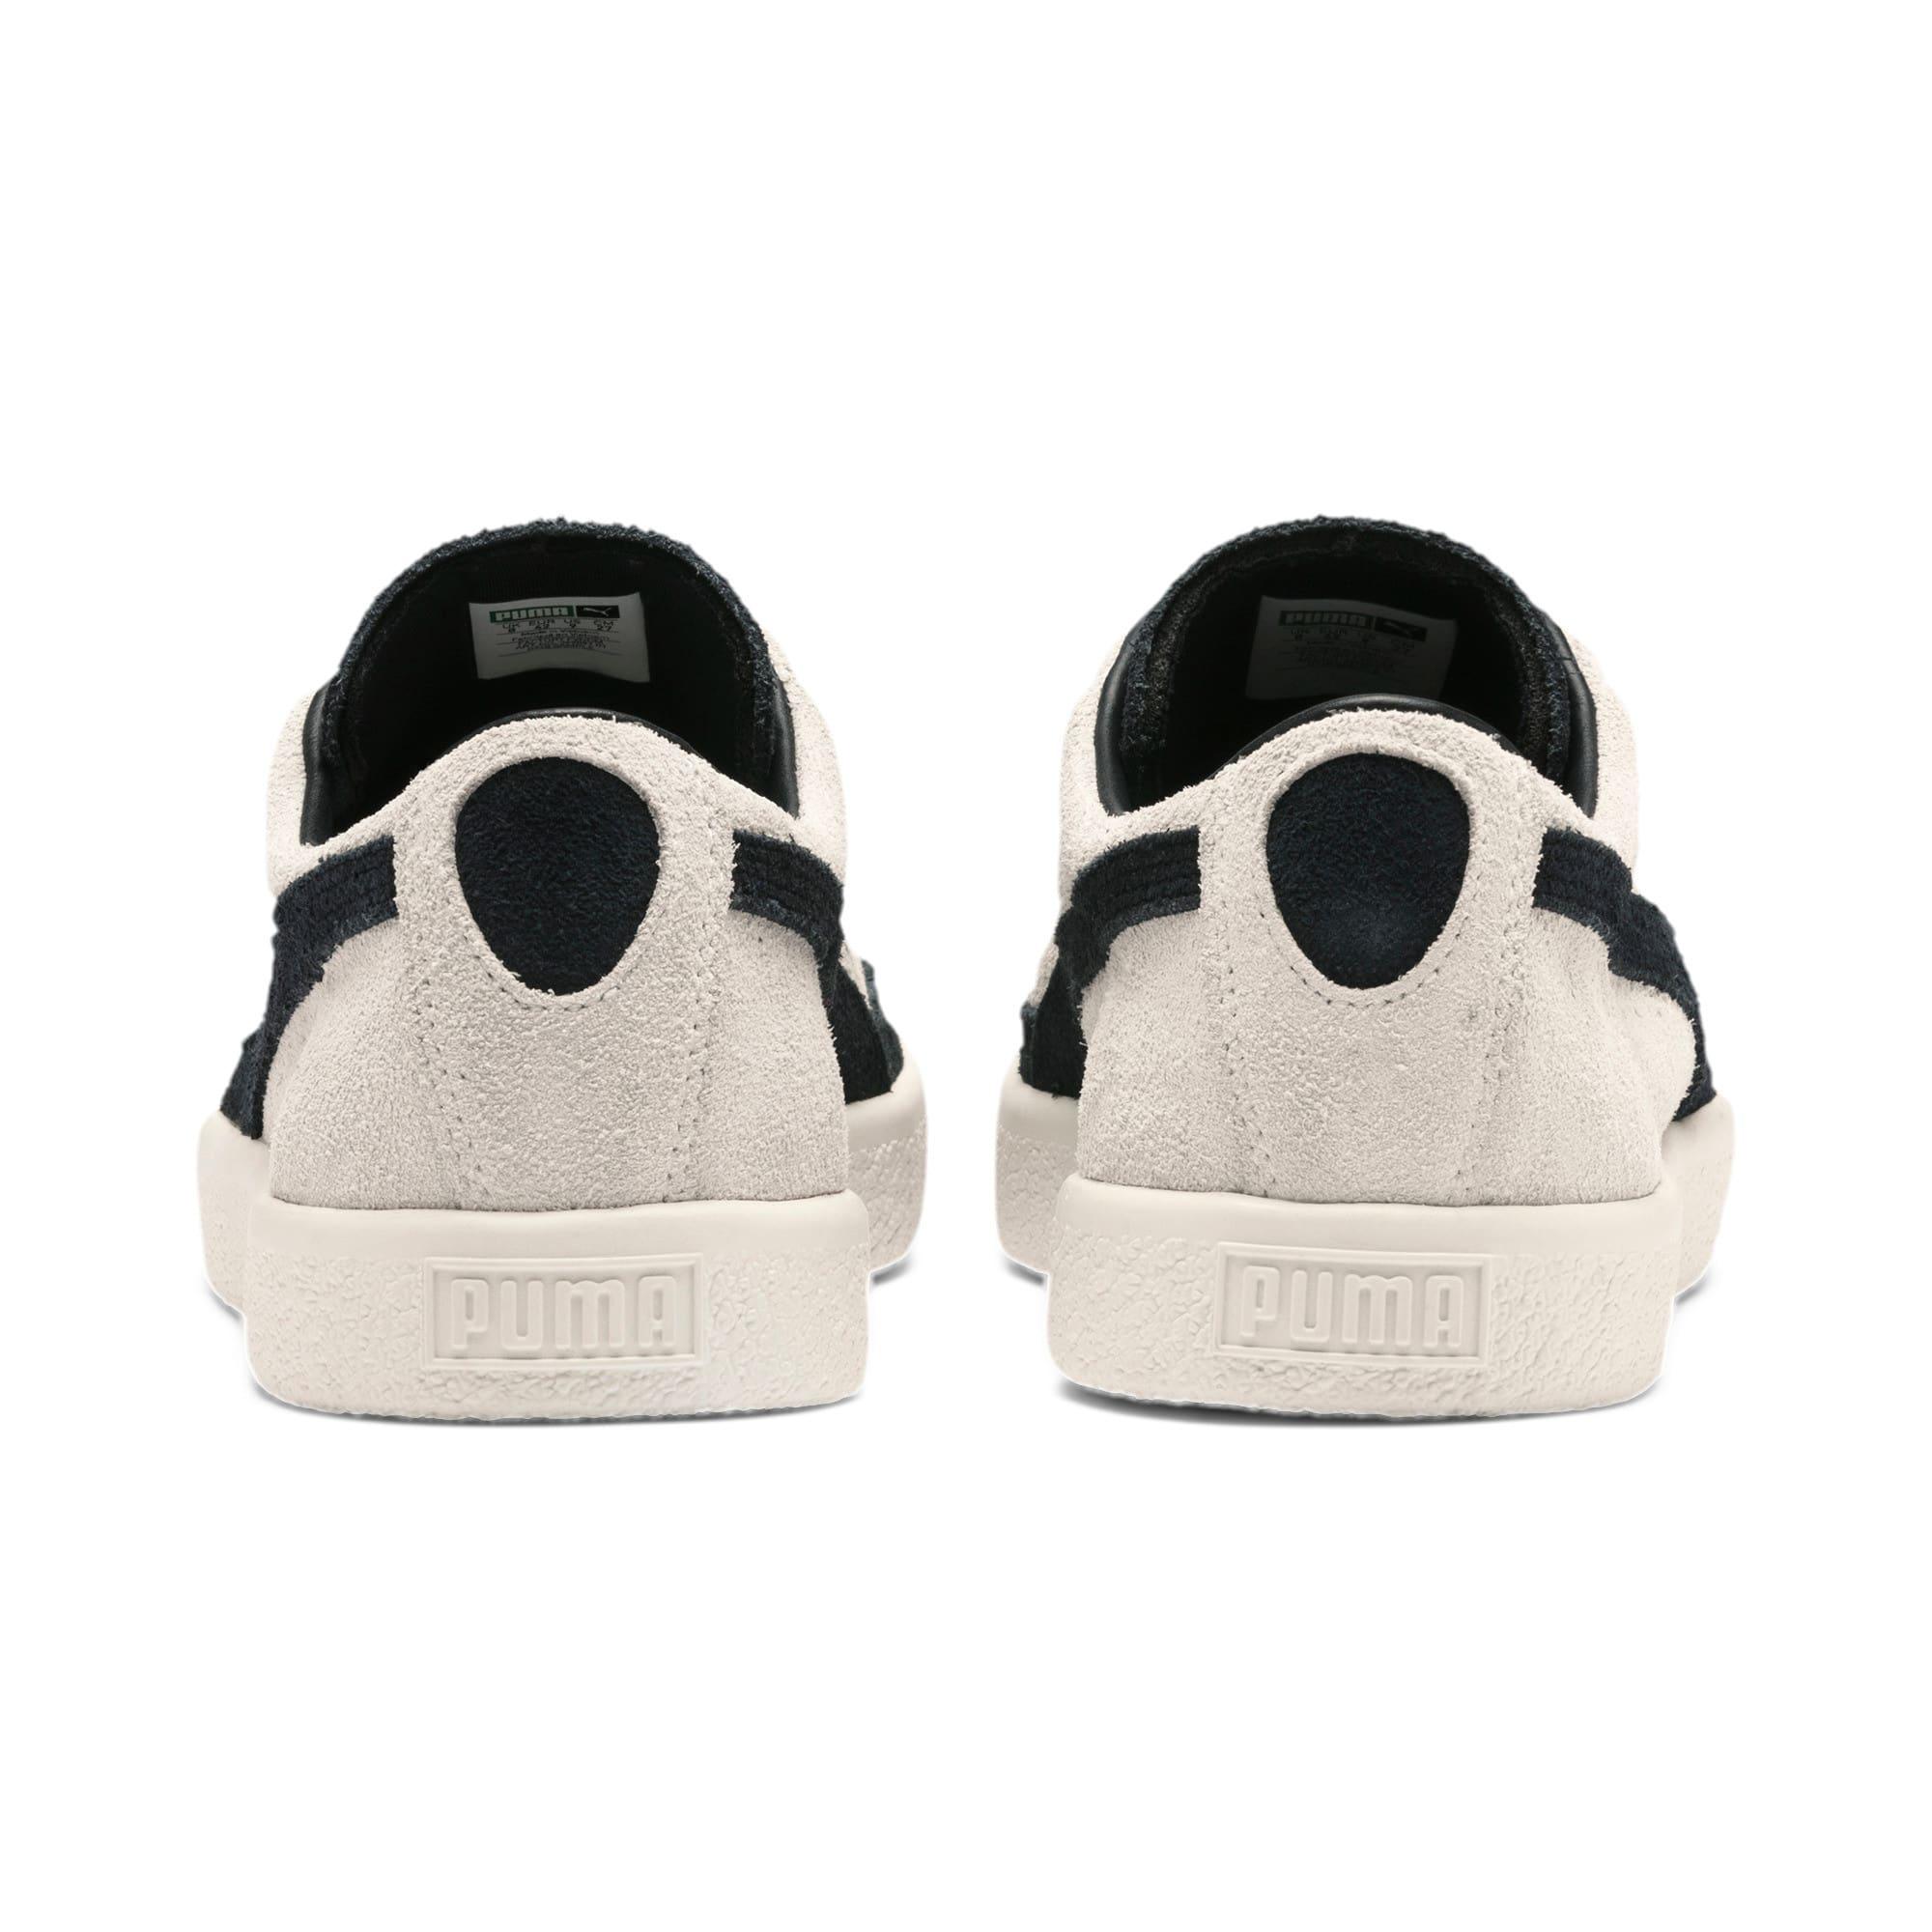 Thumbnail 5 of Suede 90681 Vintage Sneakers, Whisper White-Puma Black, medium